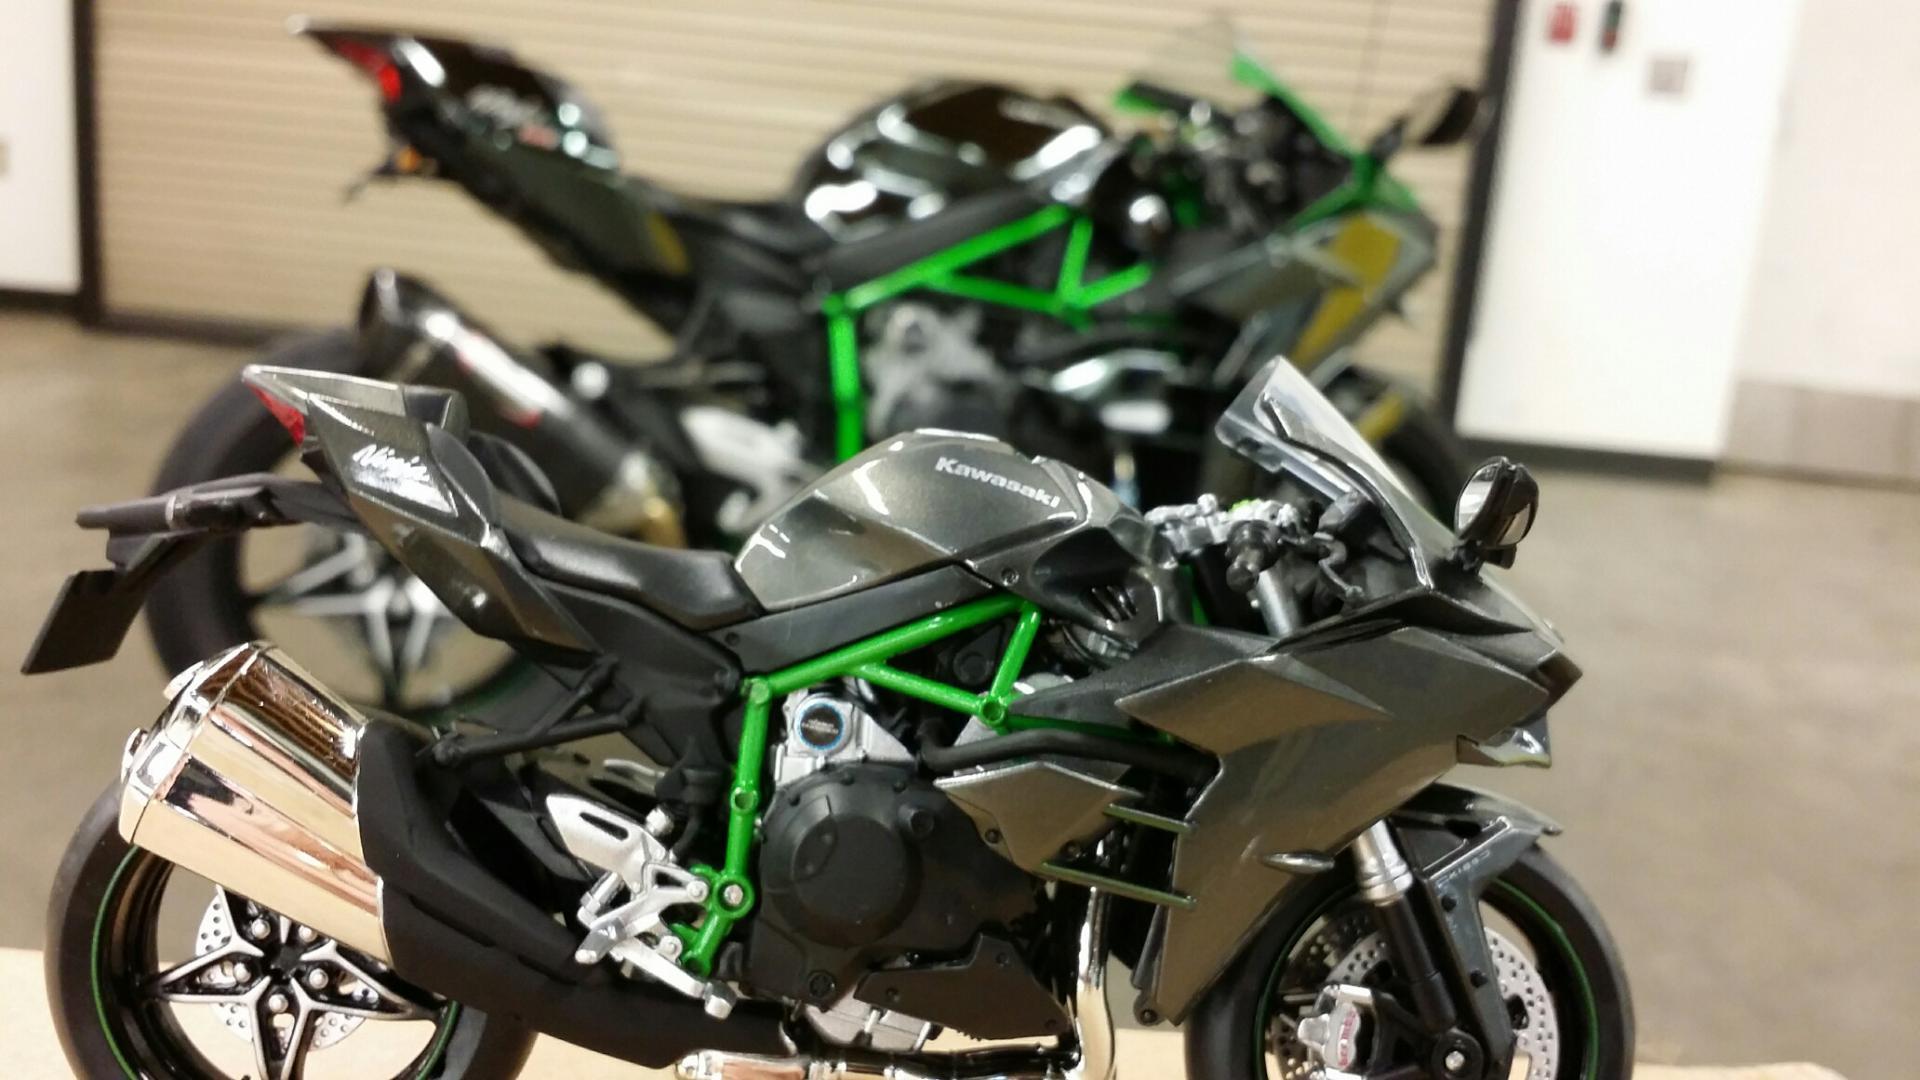 1/12 scale model H2s & H2Rs on eBay - Kawasaki Ninja H2 Forum